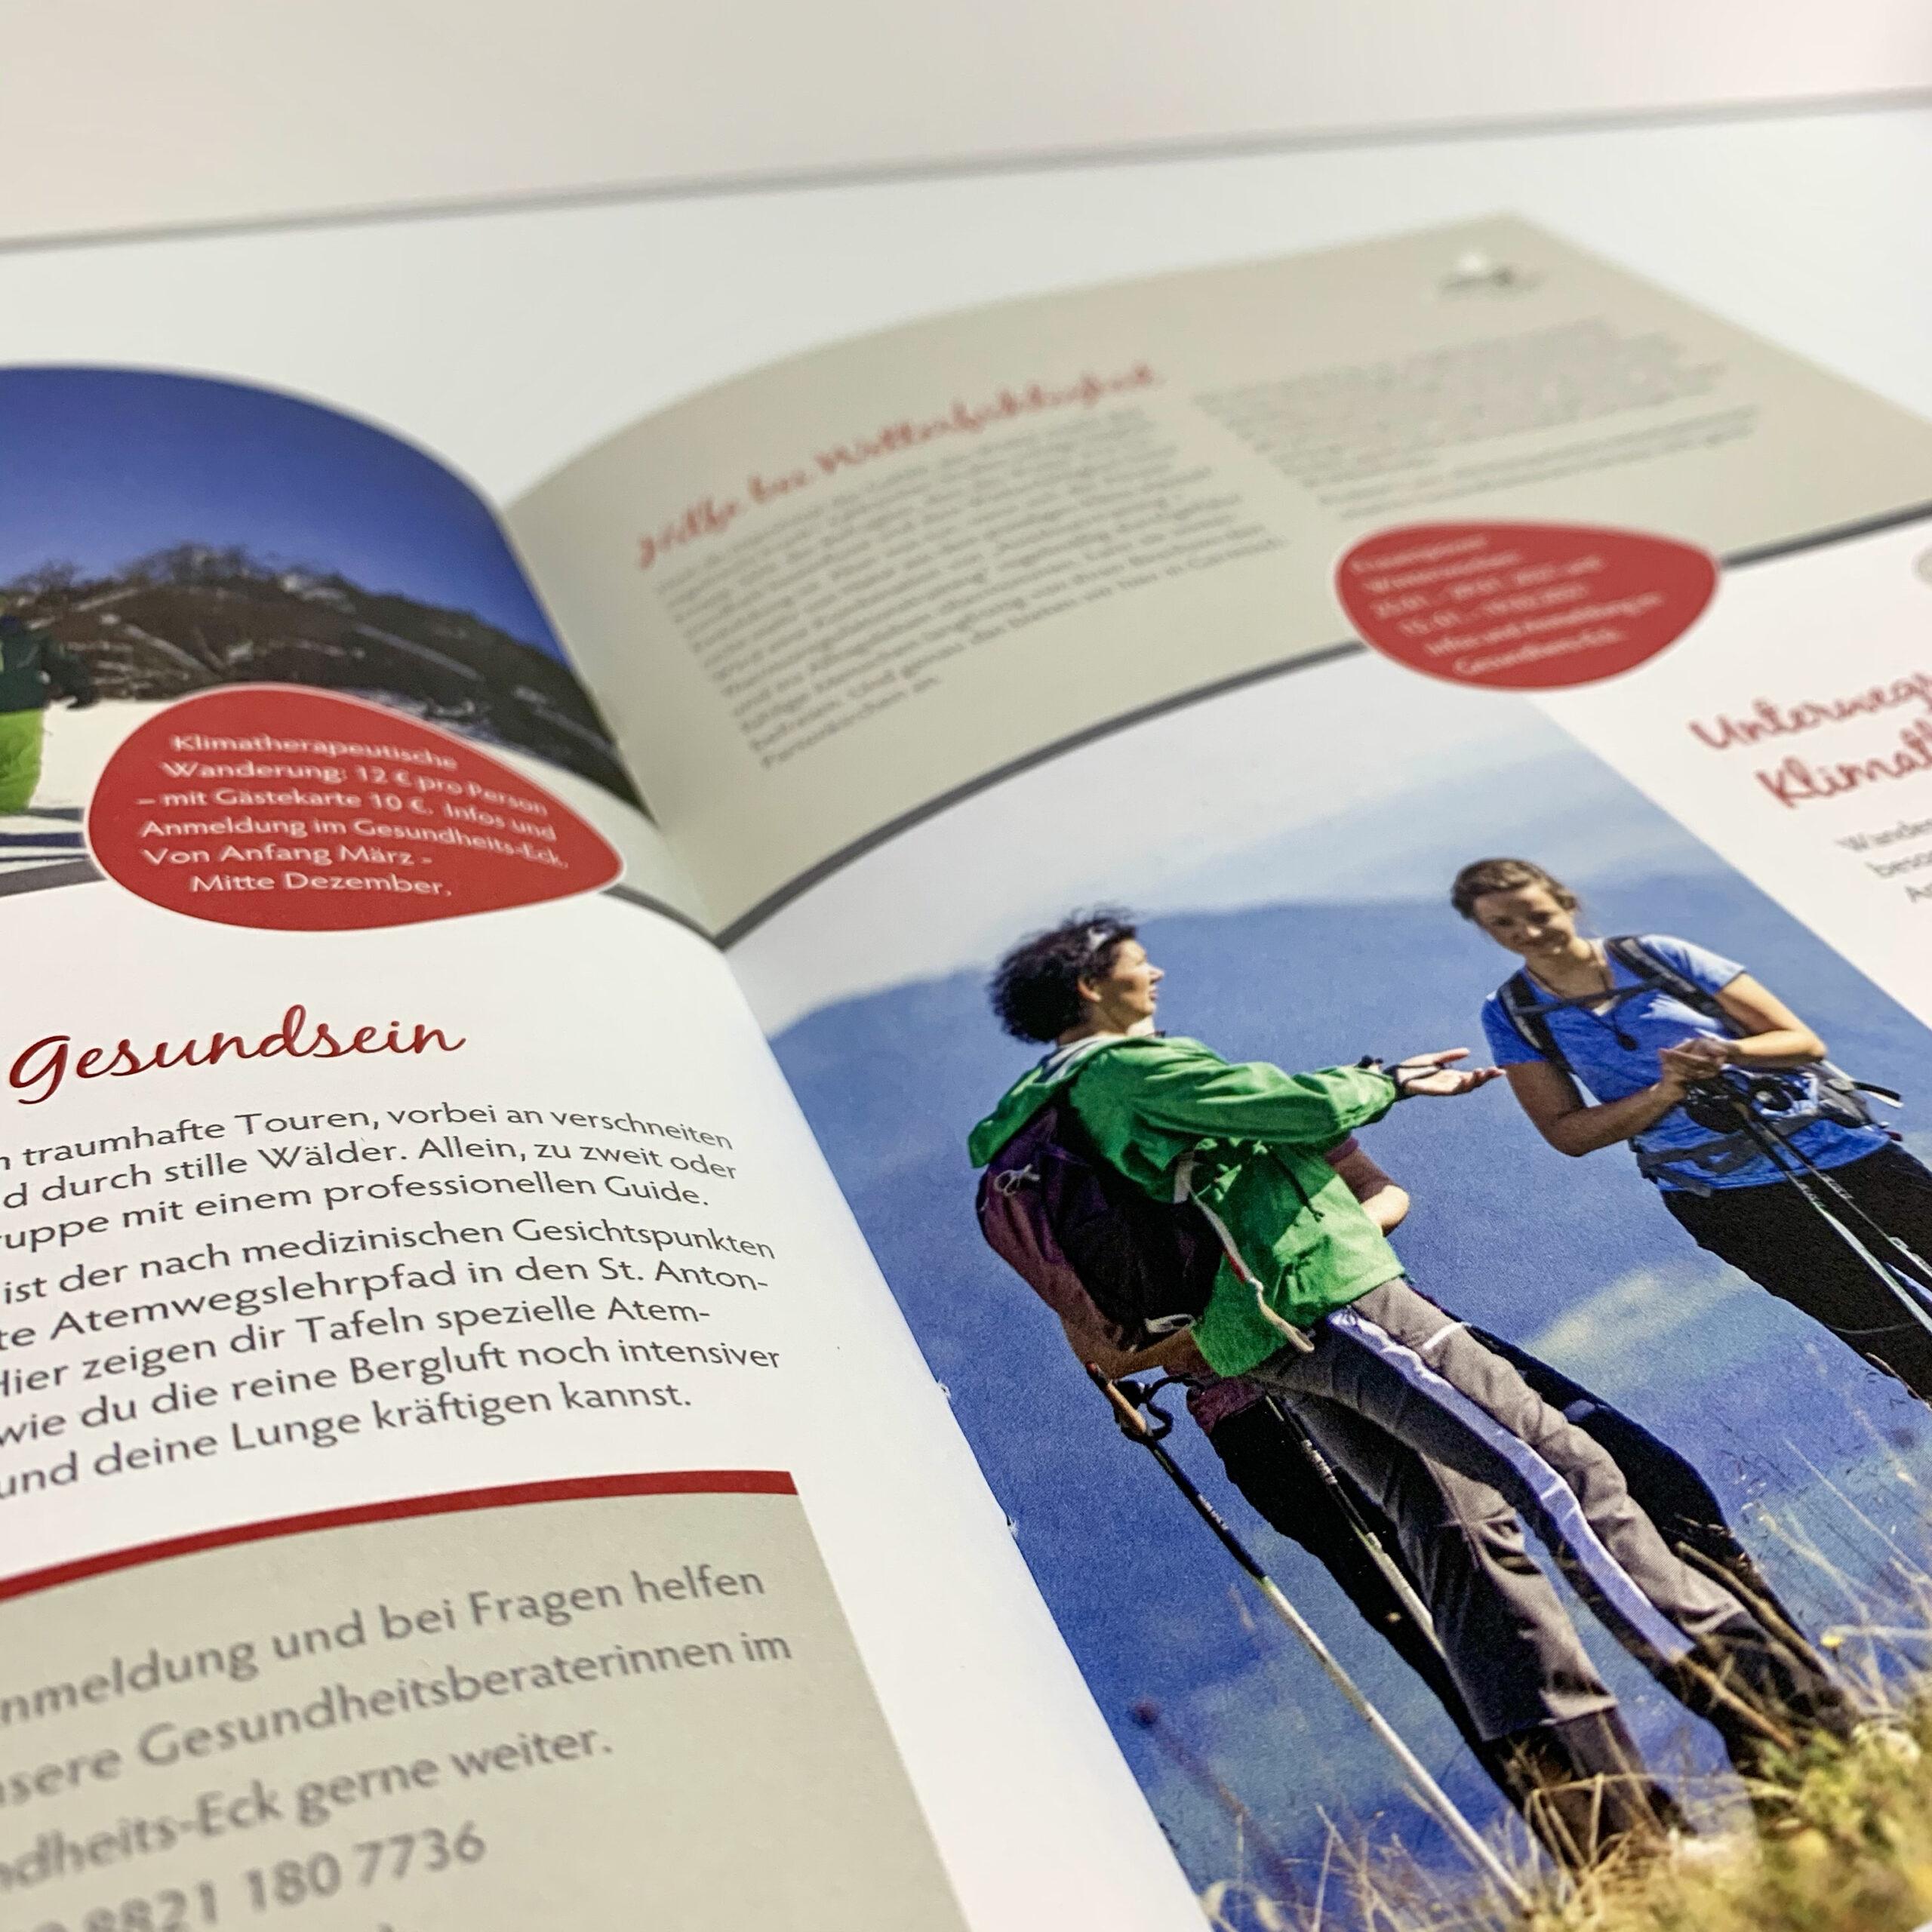 Broschuere Gapa Winter6 - Rückstichhefung Wiesendanger medien Druckerei UV-Offset